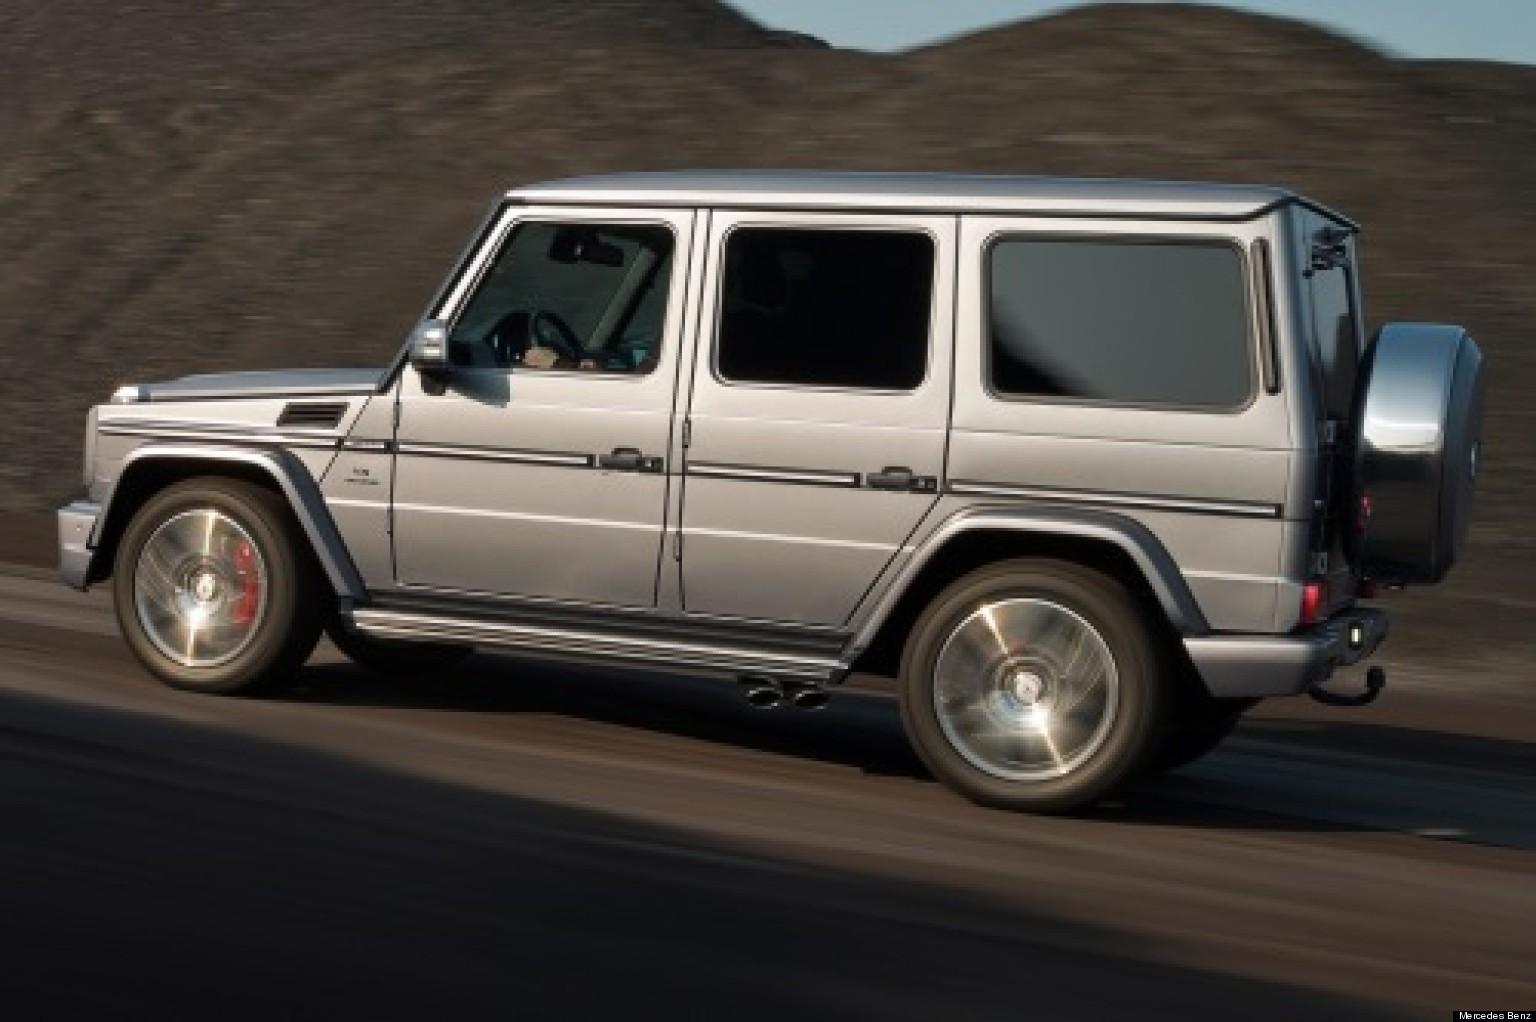 Conoce el mercedes benz g class huffpost for Mercedes benz gclass